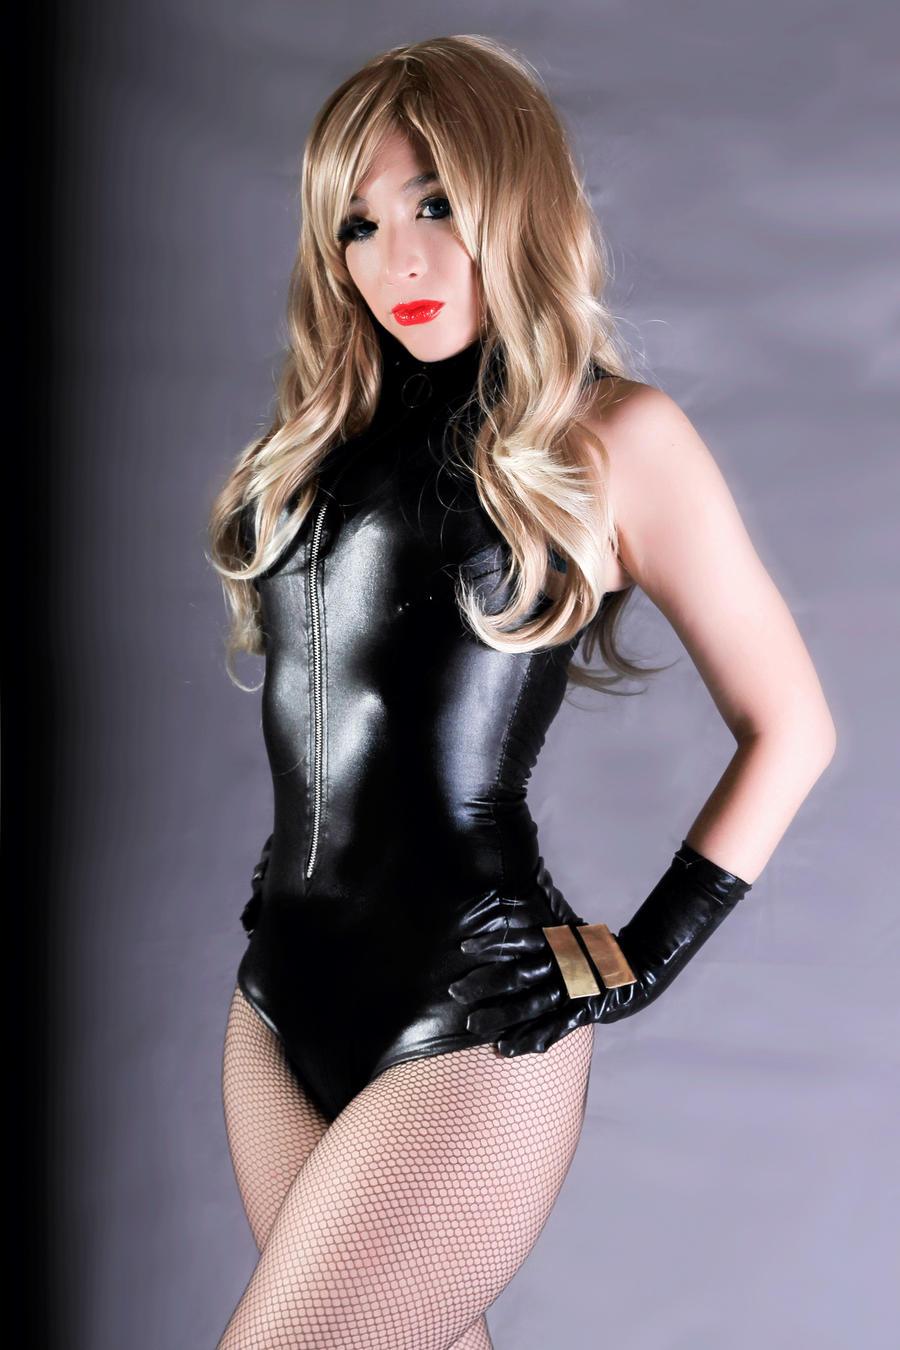 Black Canary cosplay 01 by Kitty-Honey